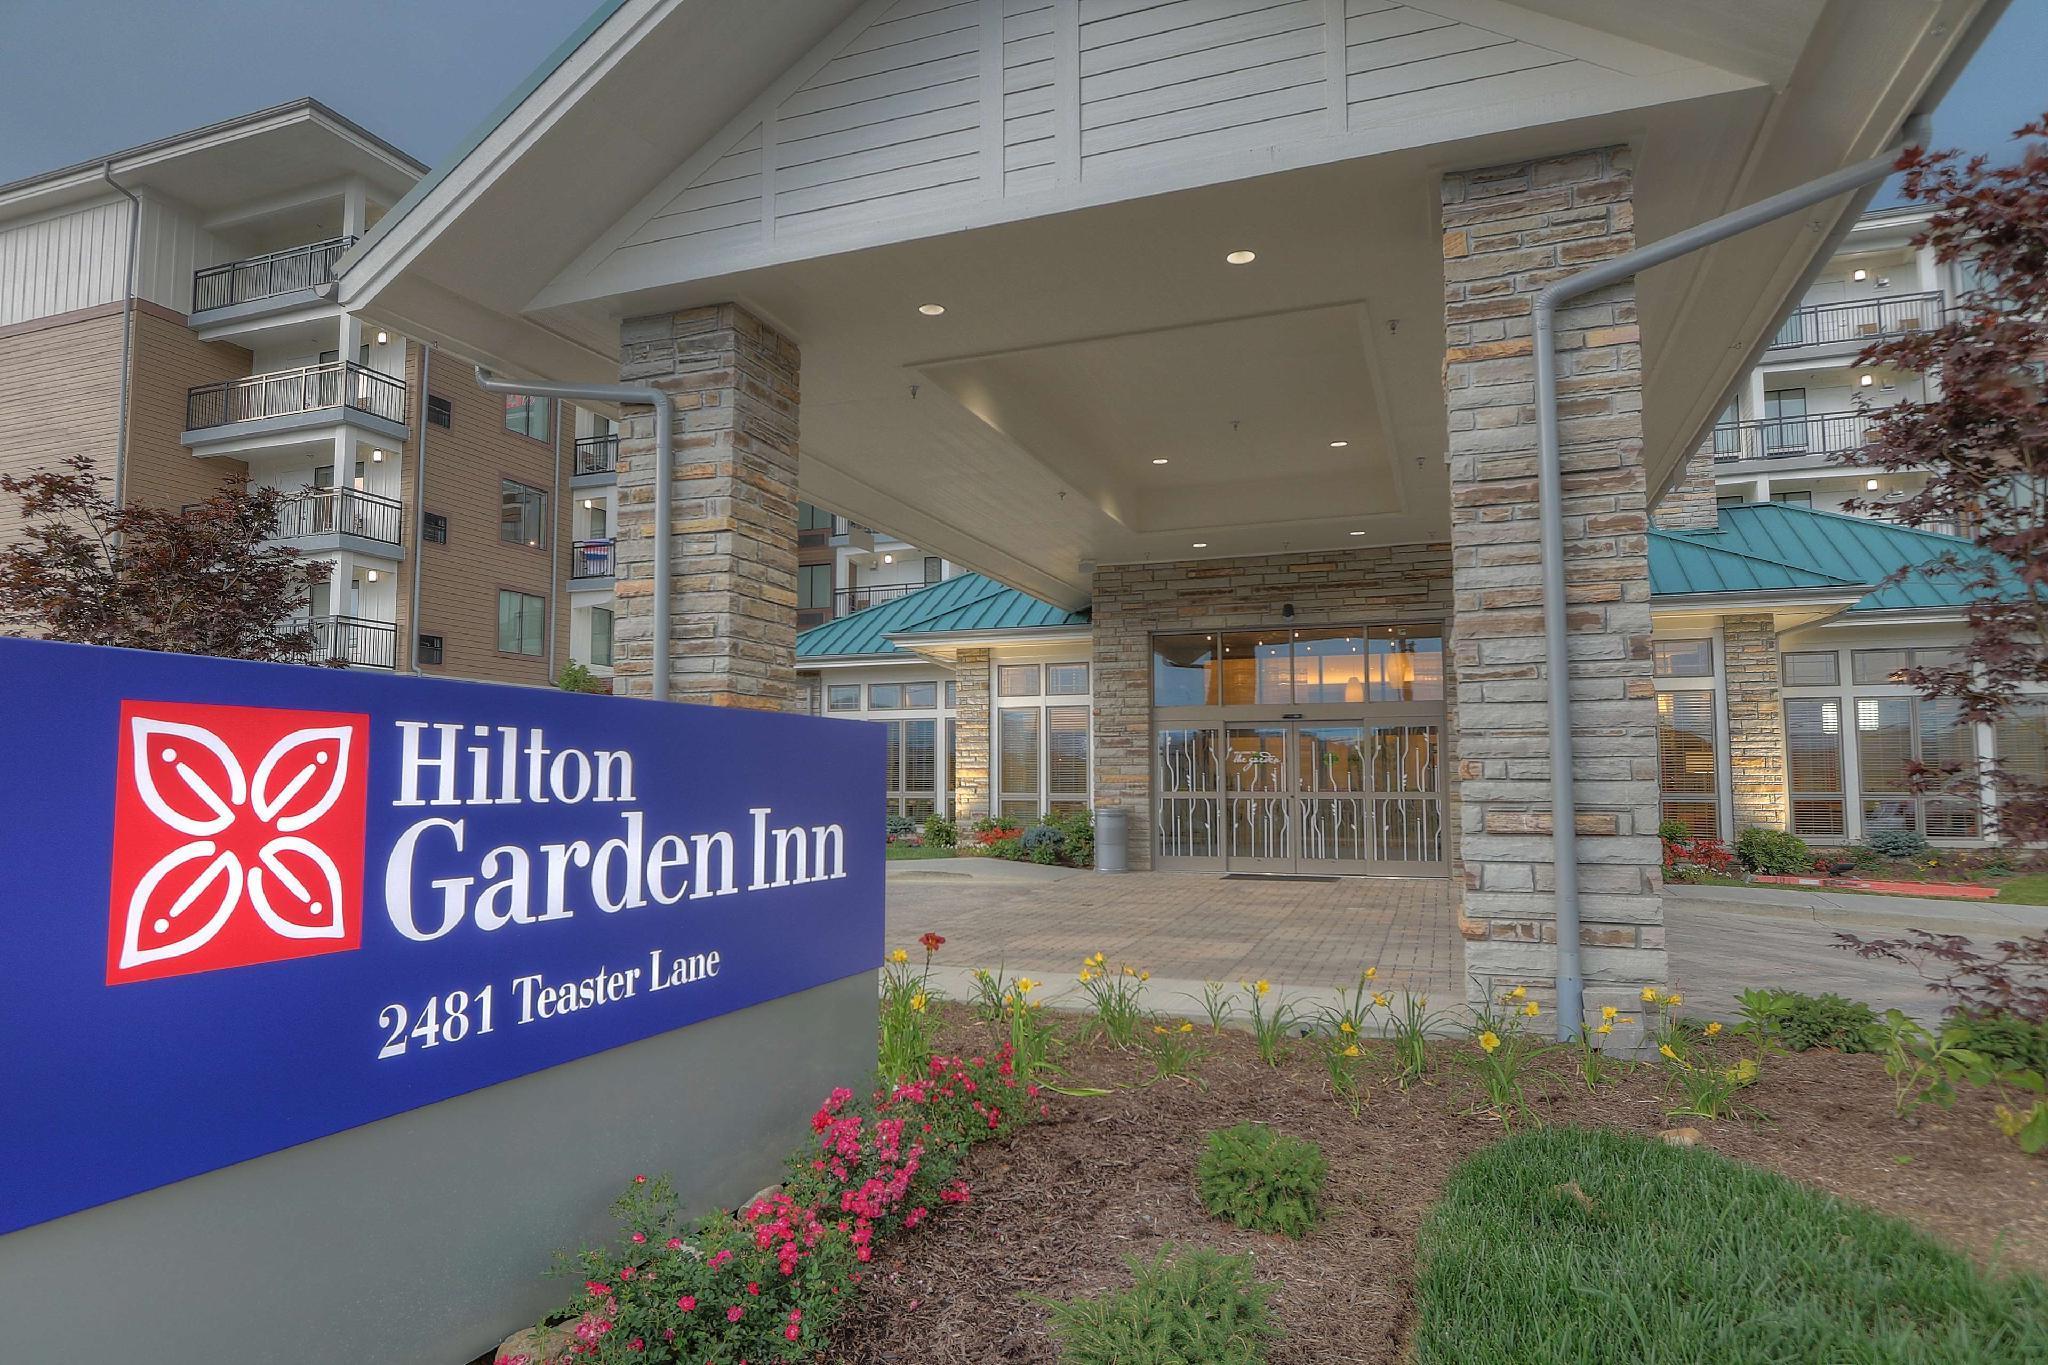 Hilton Garden Inn Pigeon Forge